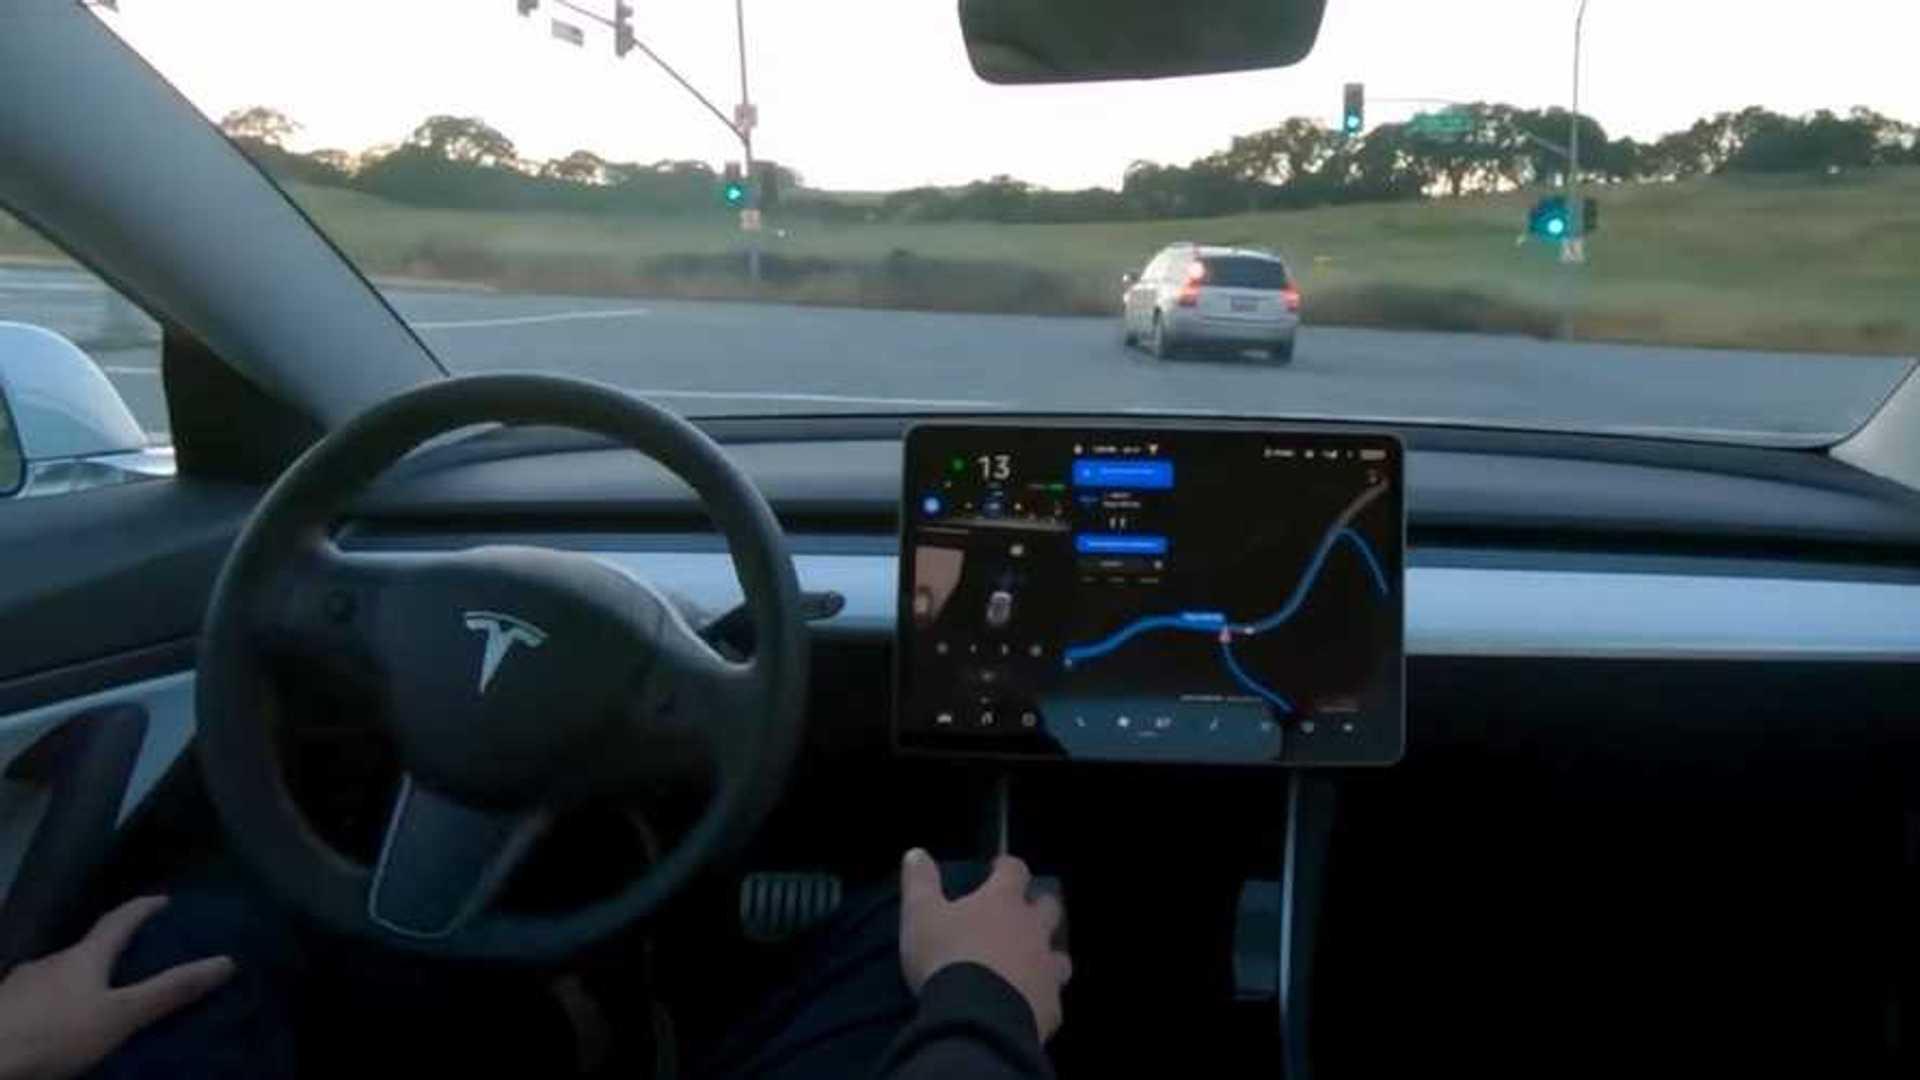 Tesla Model Y In-Depth Details: New Design And Delivery Updates